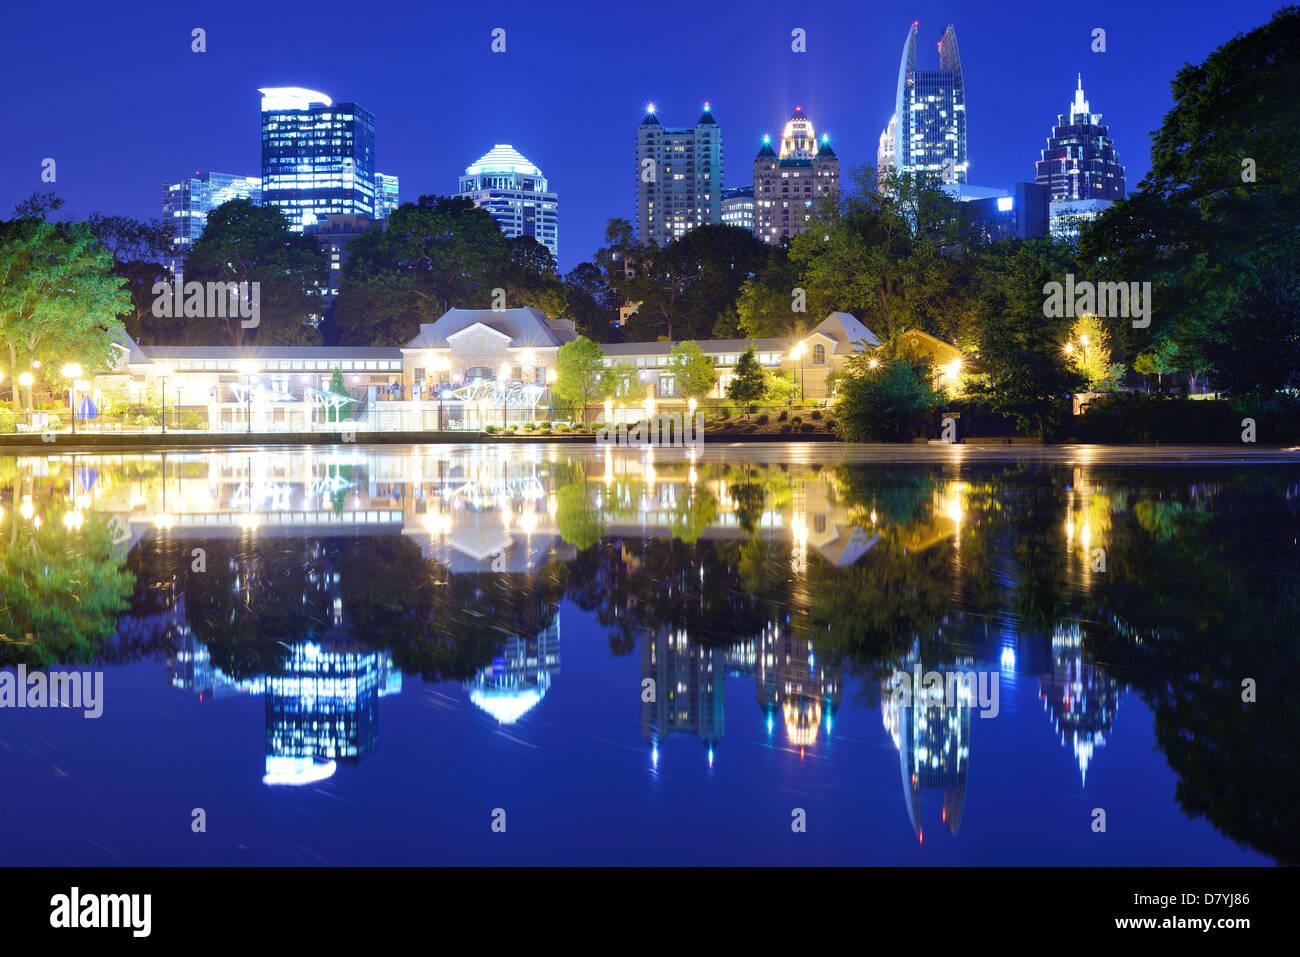 Mditown Atlanta, Georgia from Piedmont Park - Stock Image